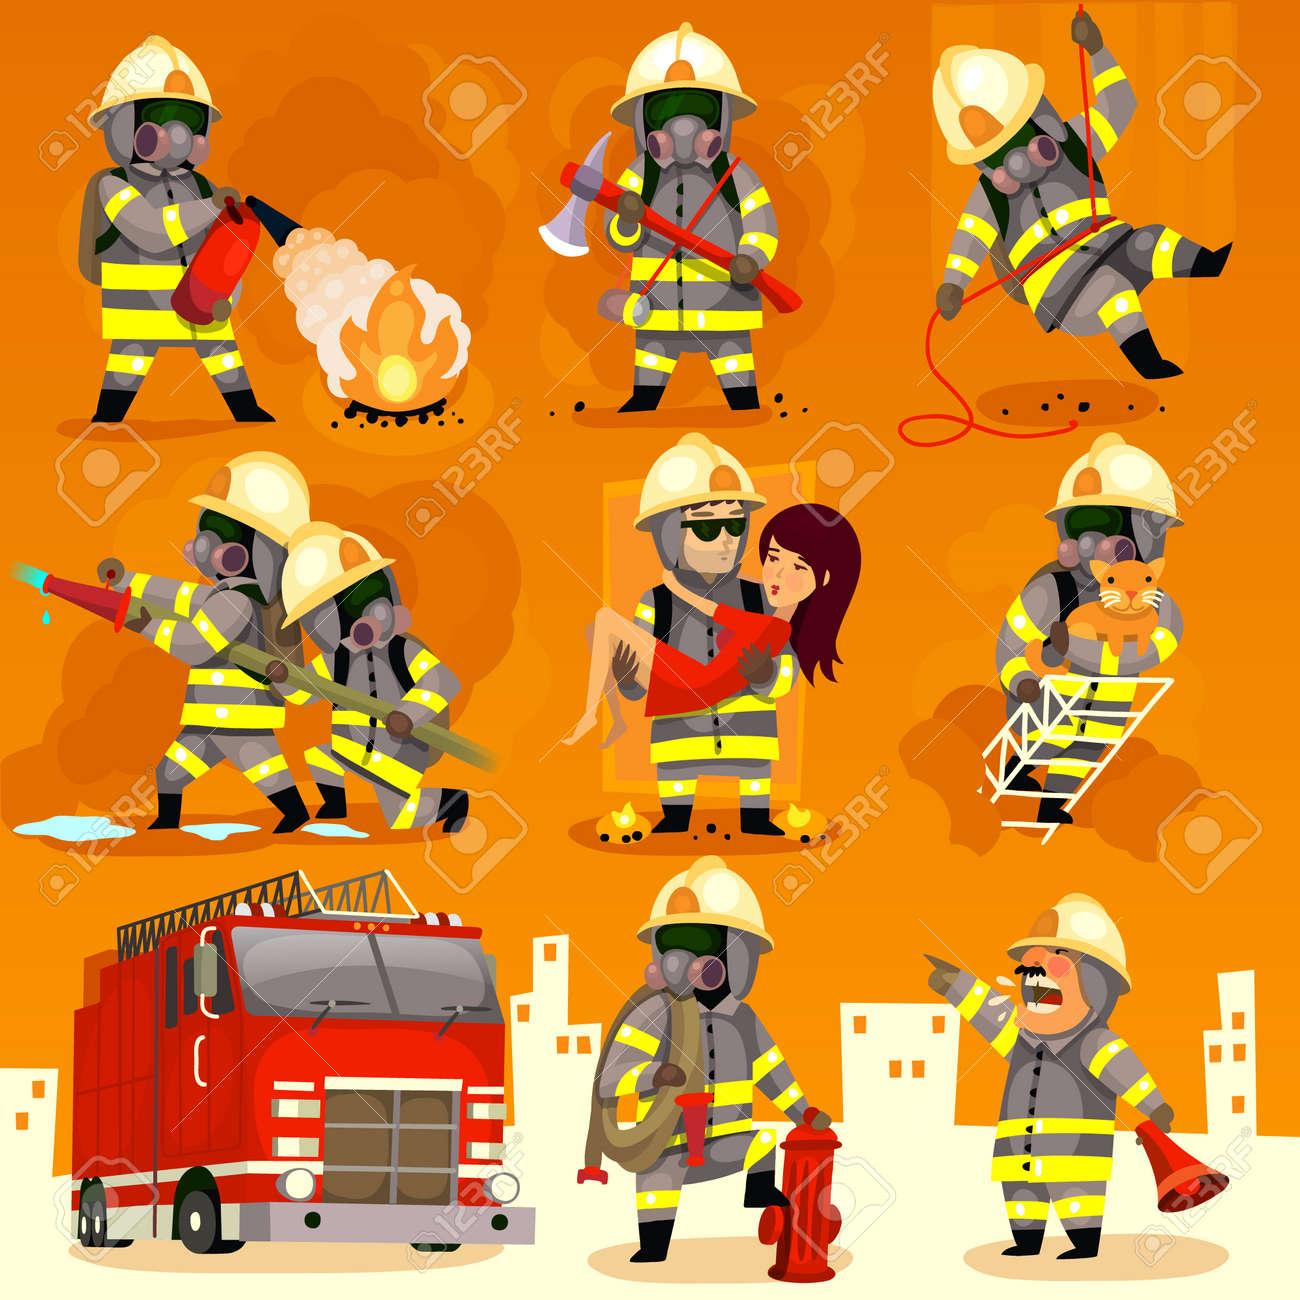 Set of cartoon fireman doing their job and saving people. - 35049176